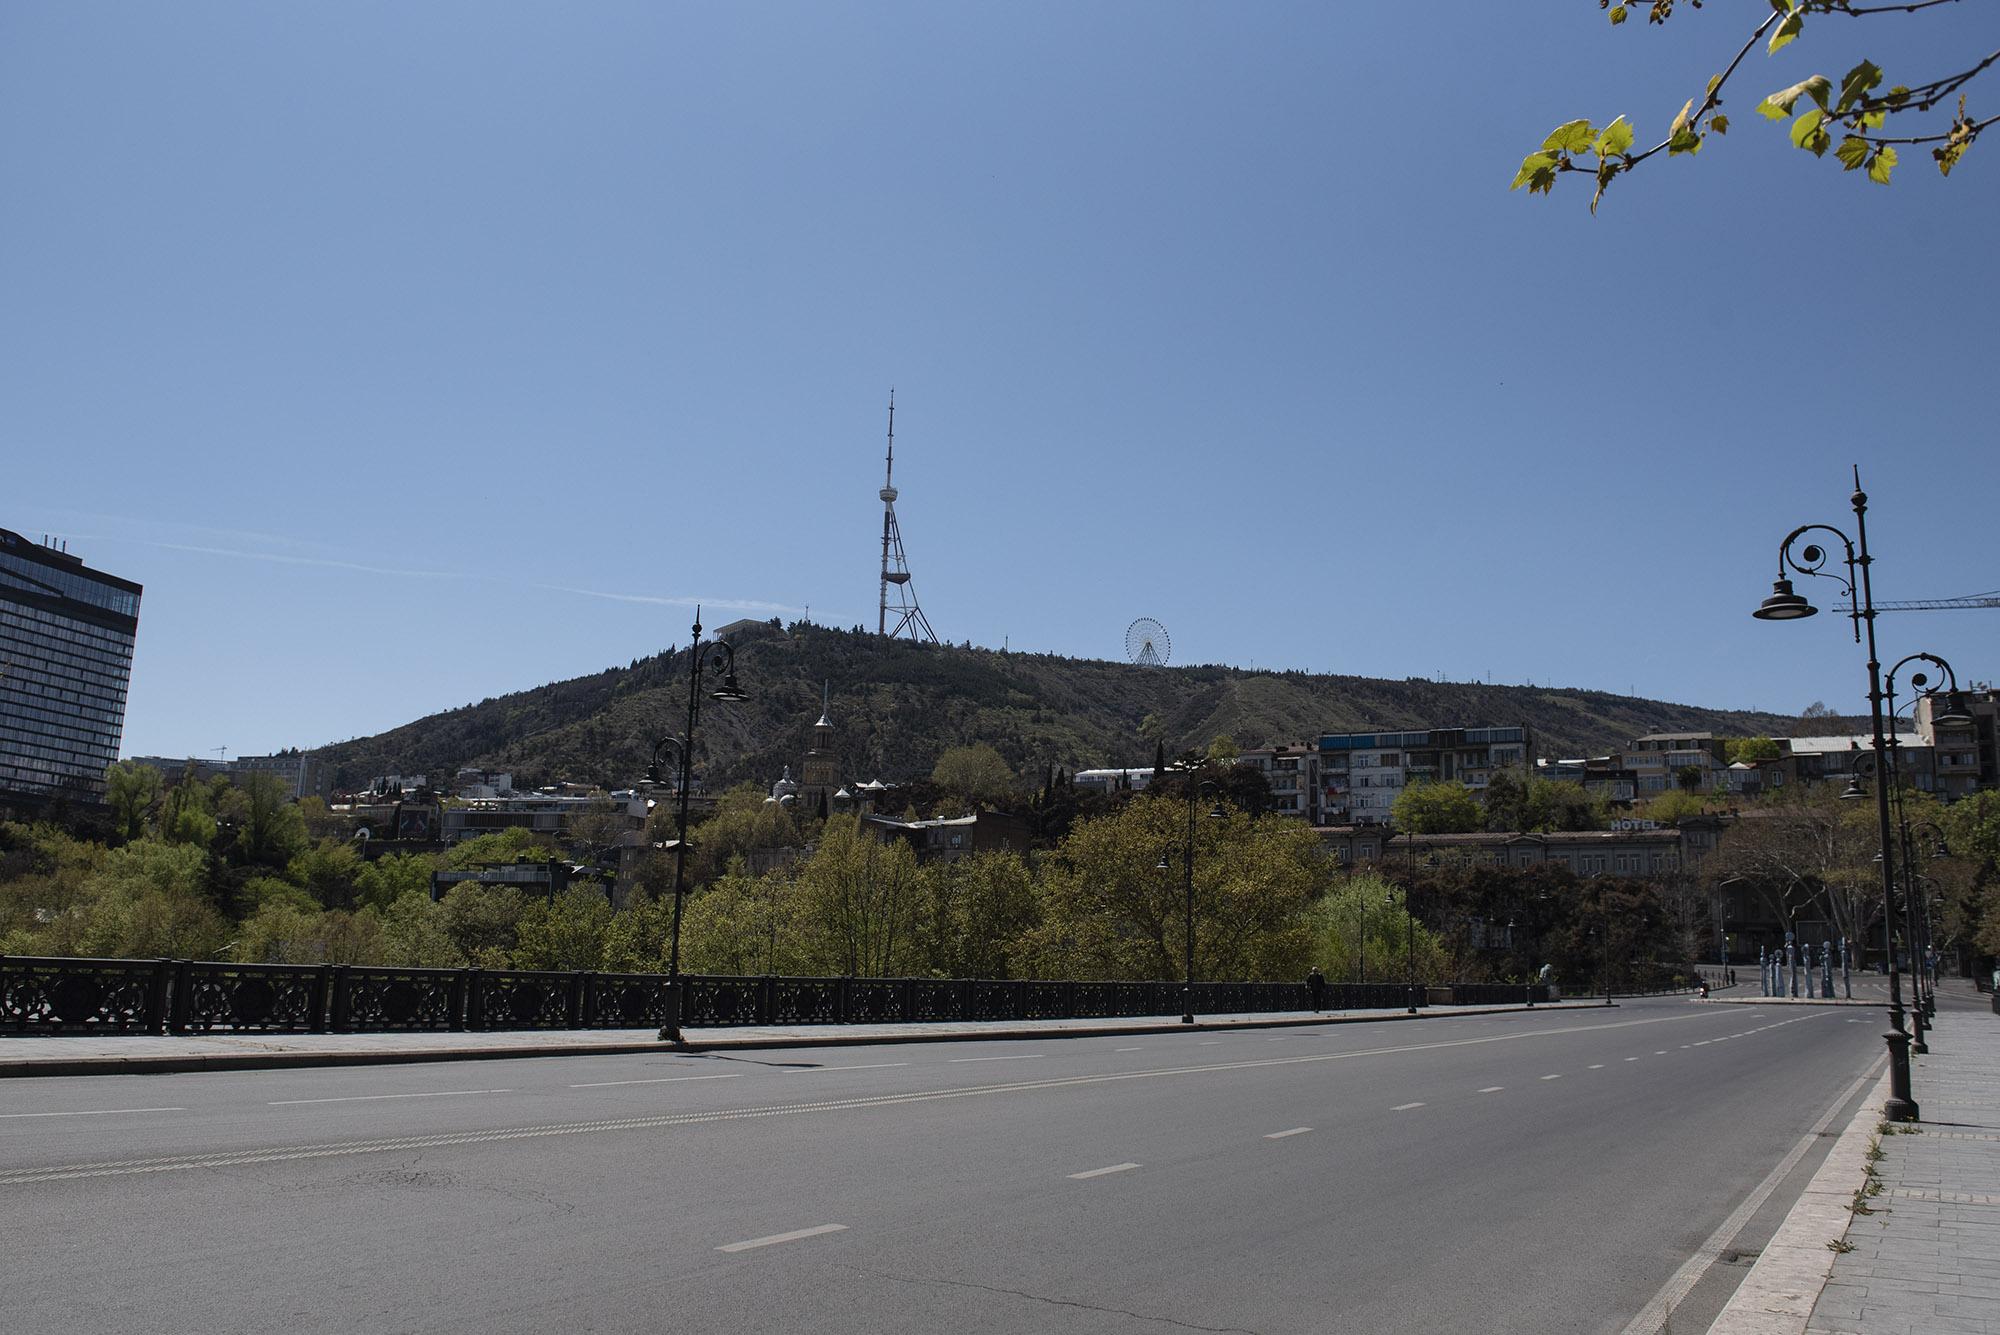 Galaktioni Bridge. Photo: Mariam Nikuradze/OC Media